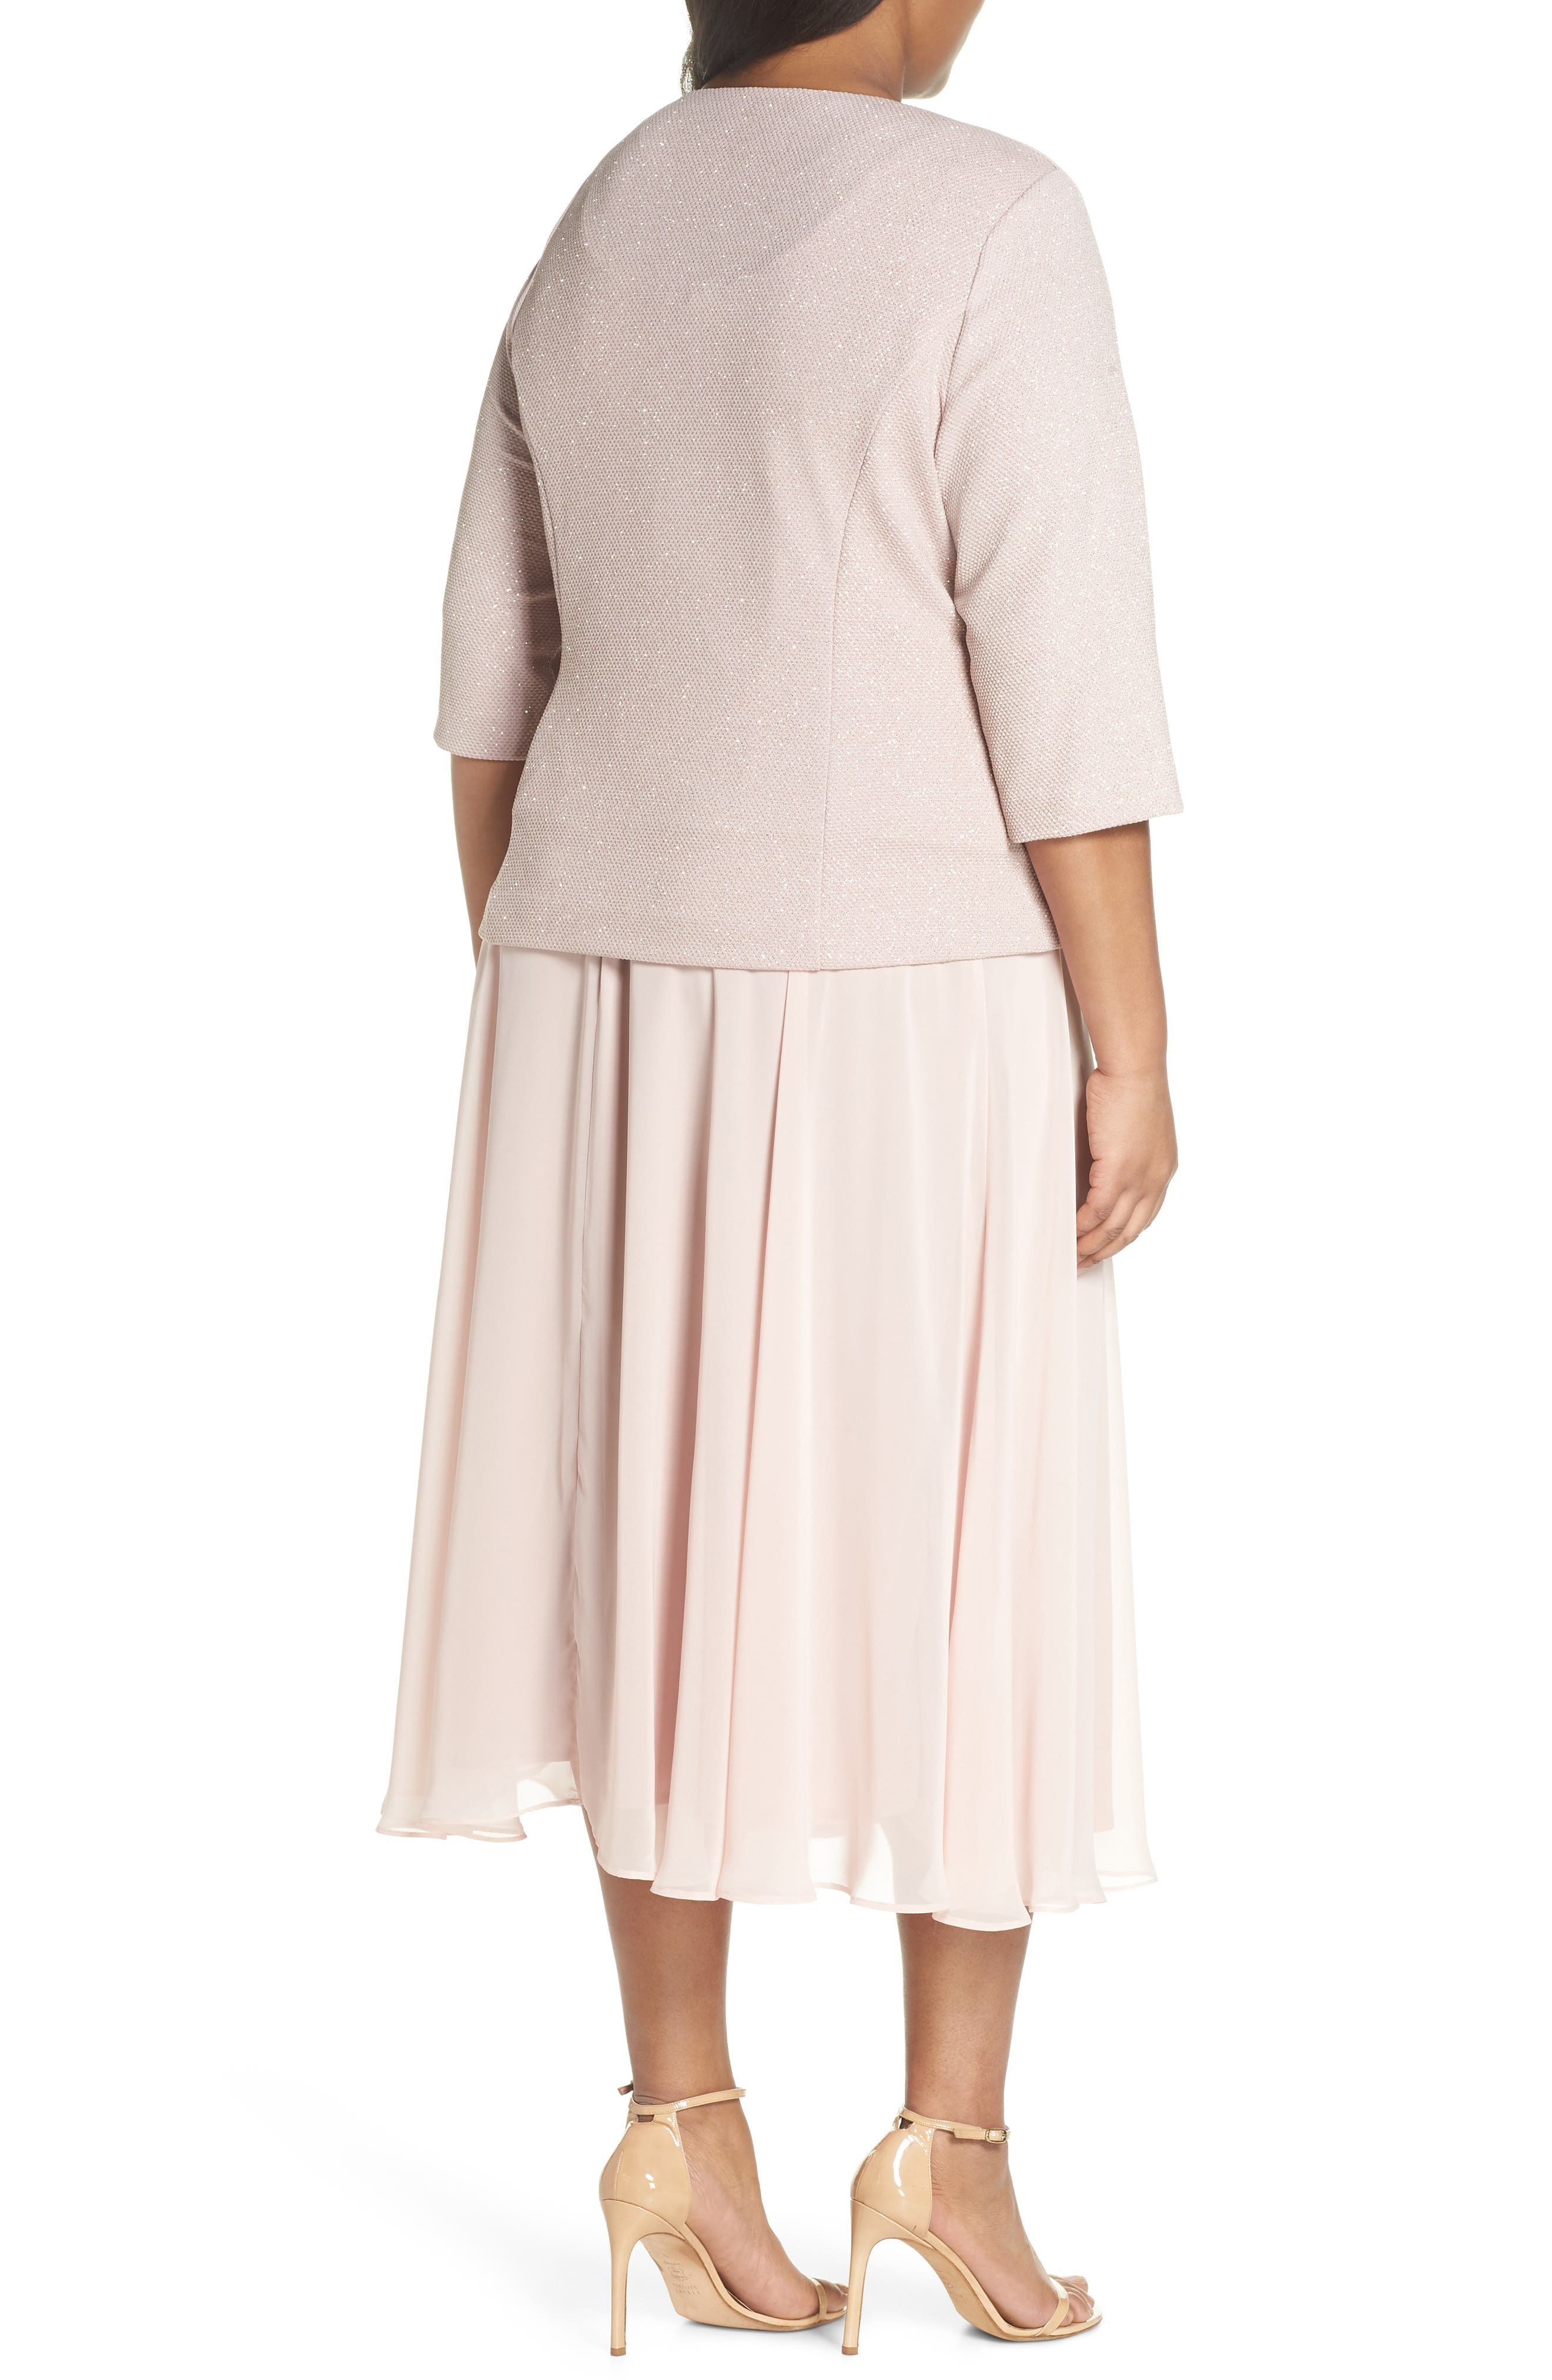 Glitter Tea Length A-Line Dress with Jacket,                             Alternate thumbnail 2, color,                             680